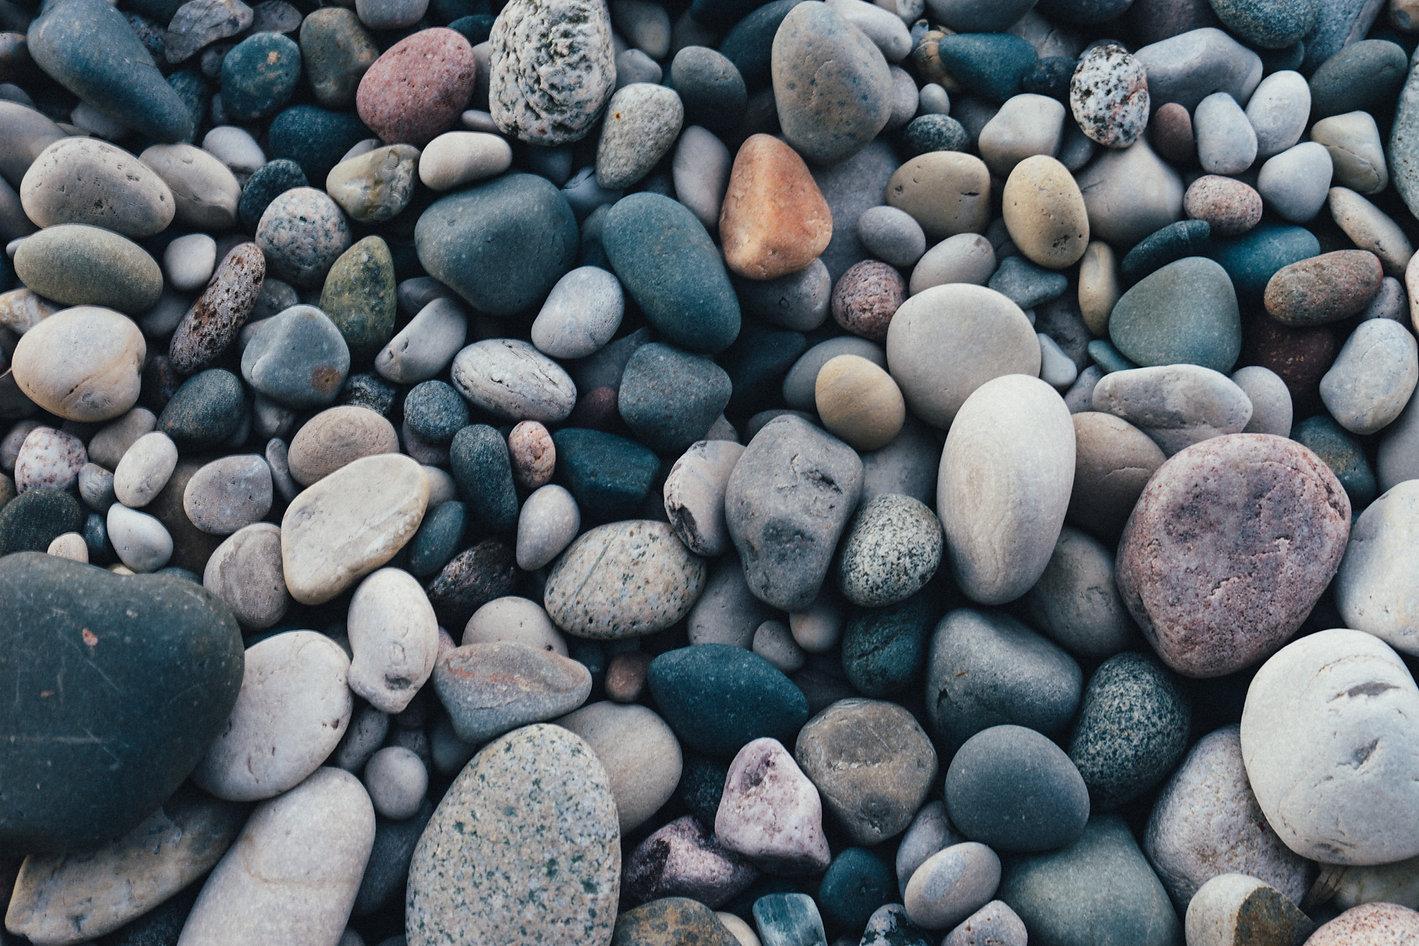 photography-of-stones-1029604.jpg